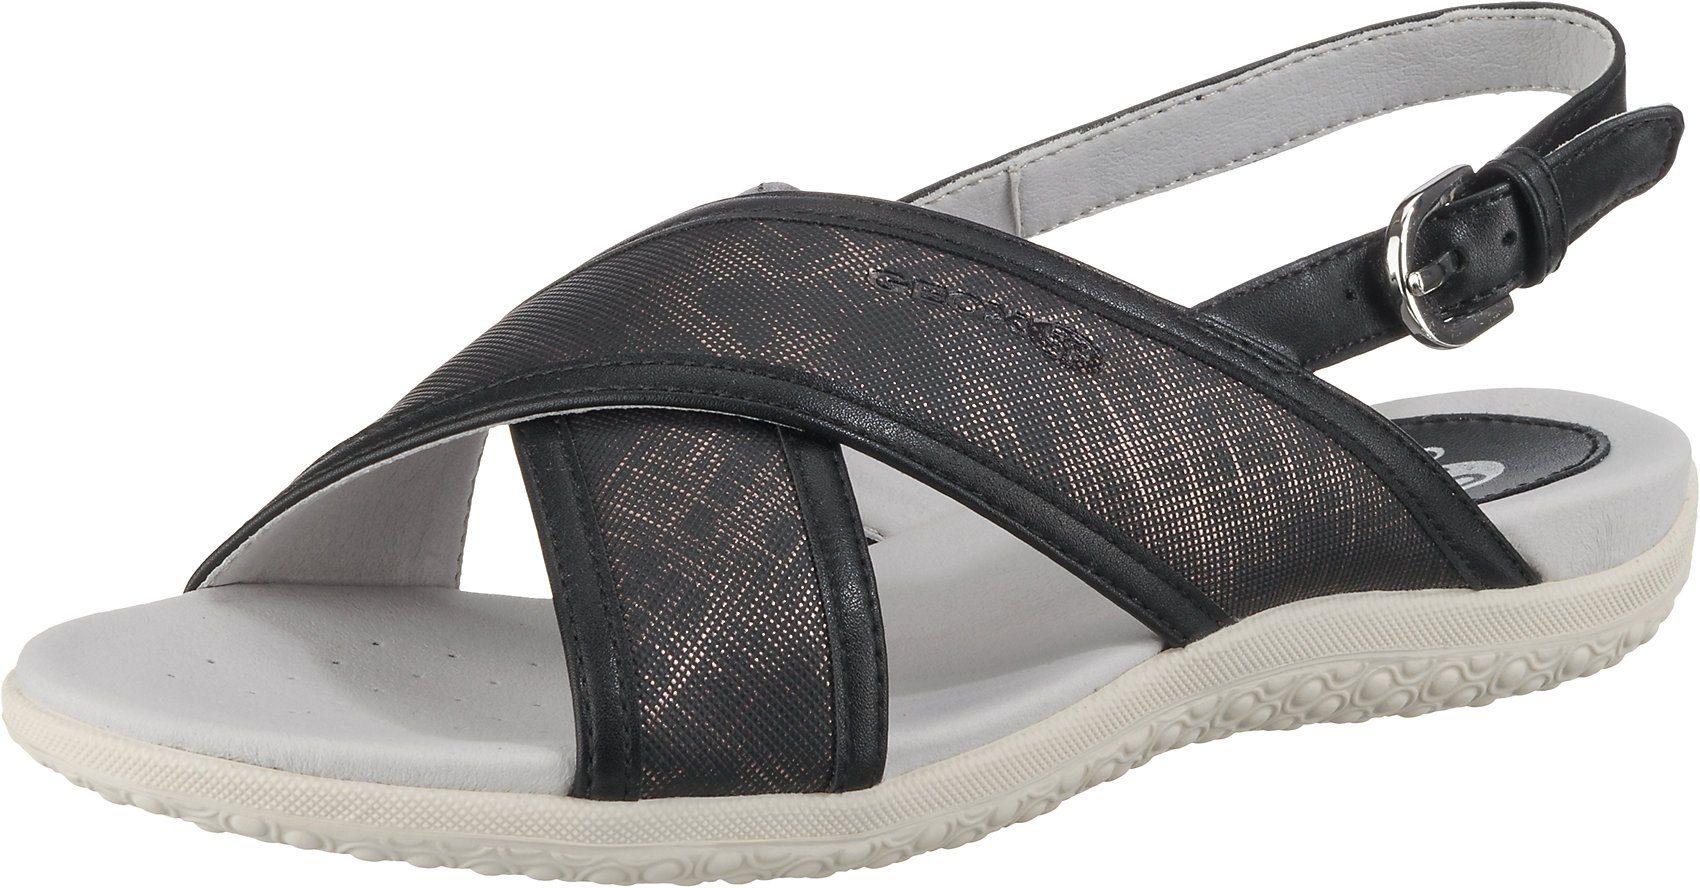 Geox »Komfort Sandalen« Sandale, Obermaterial: Materialmix online kaufen | OTTO